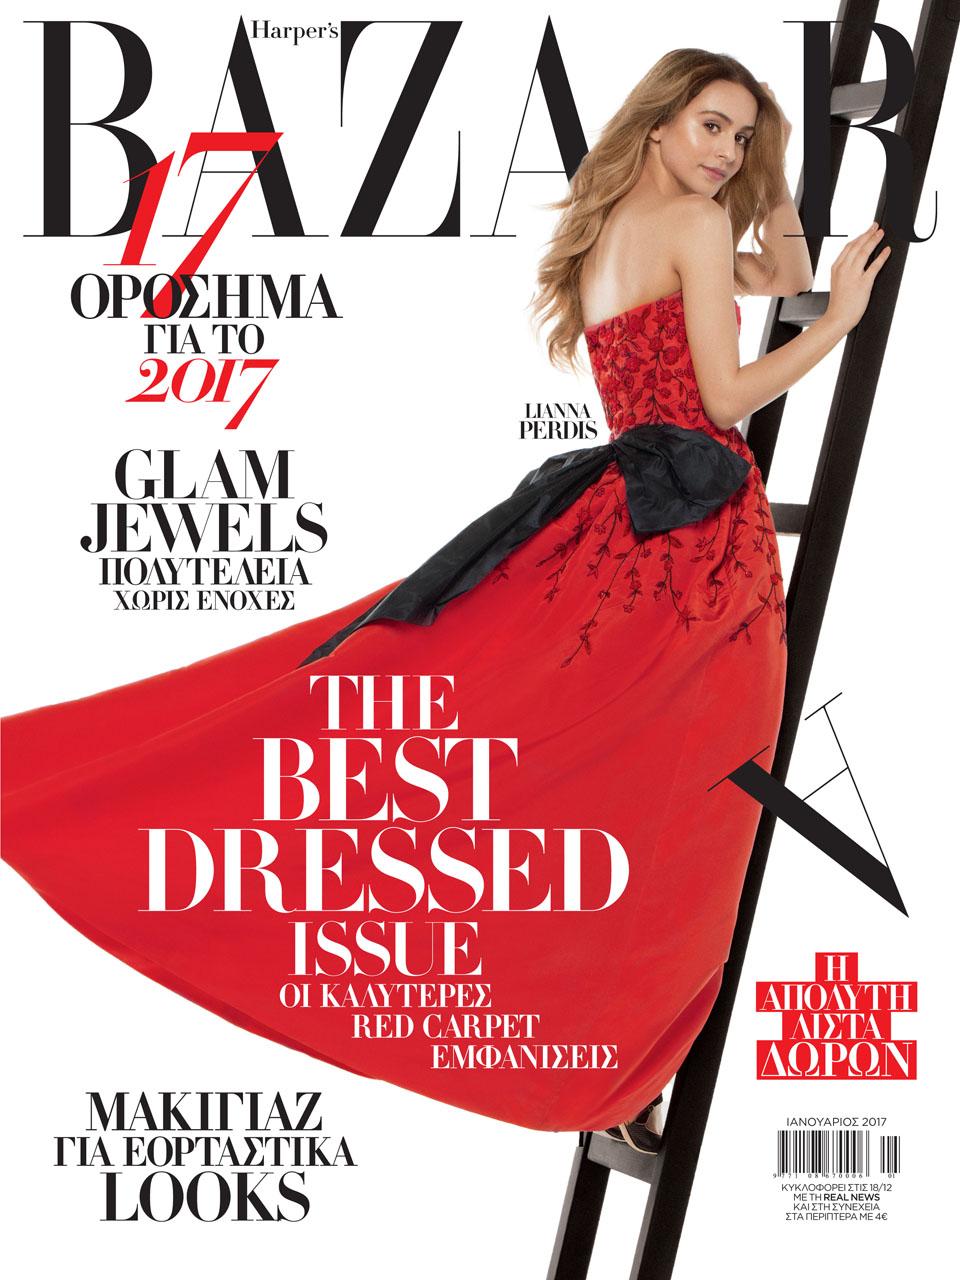 Dazzling Liana Perdis in a festive mood on the cover of Harper's Bazaar.